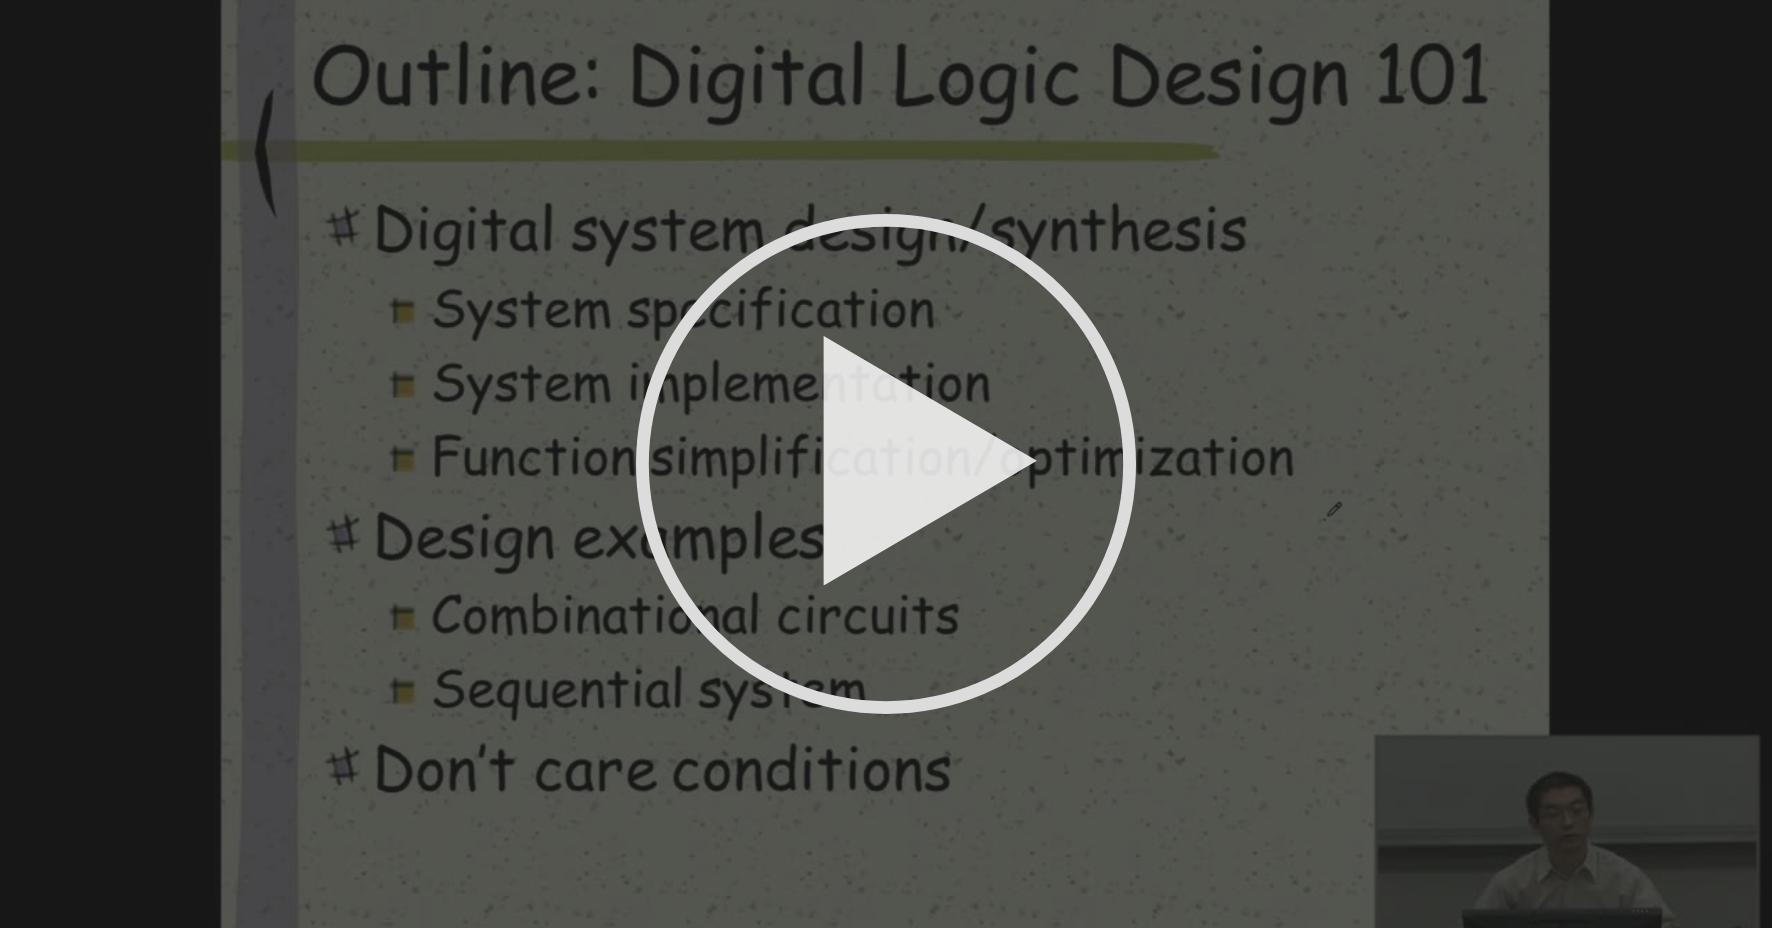 Digital System Specification Digital System Design Basics And Vulnerabilities Coursera